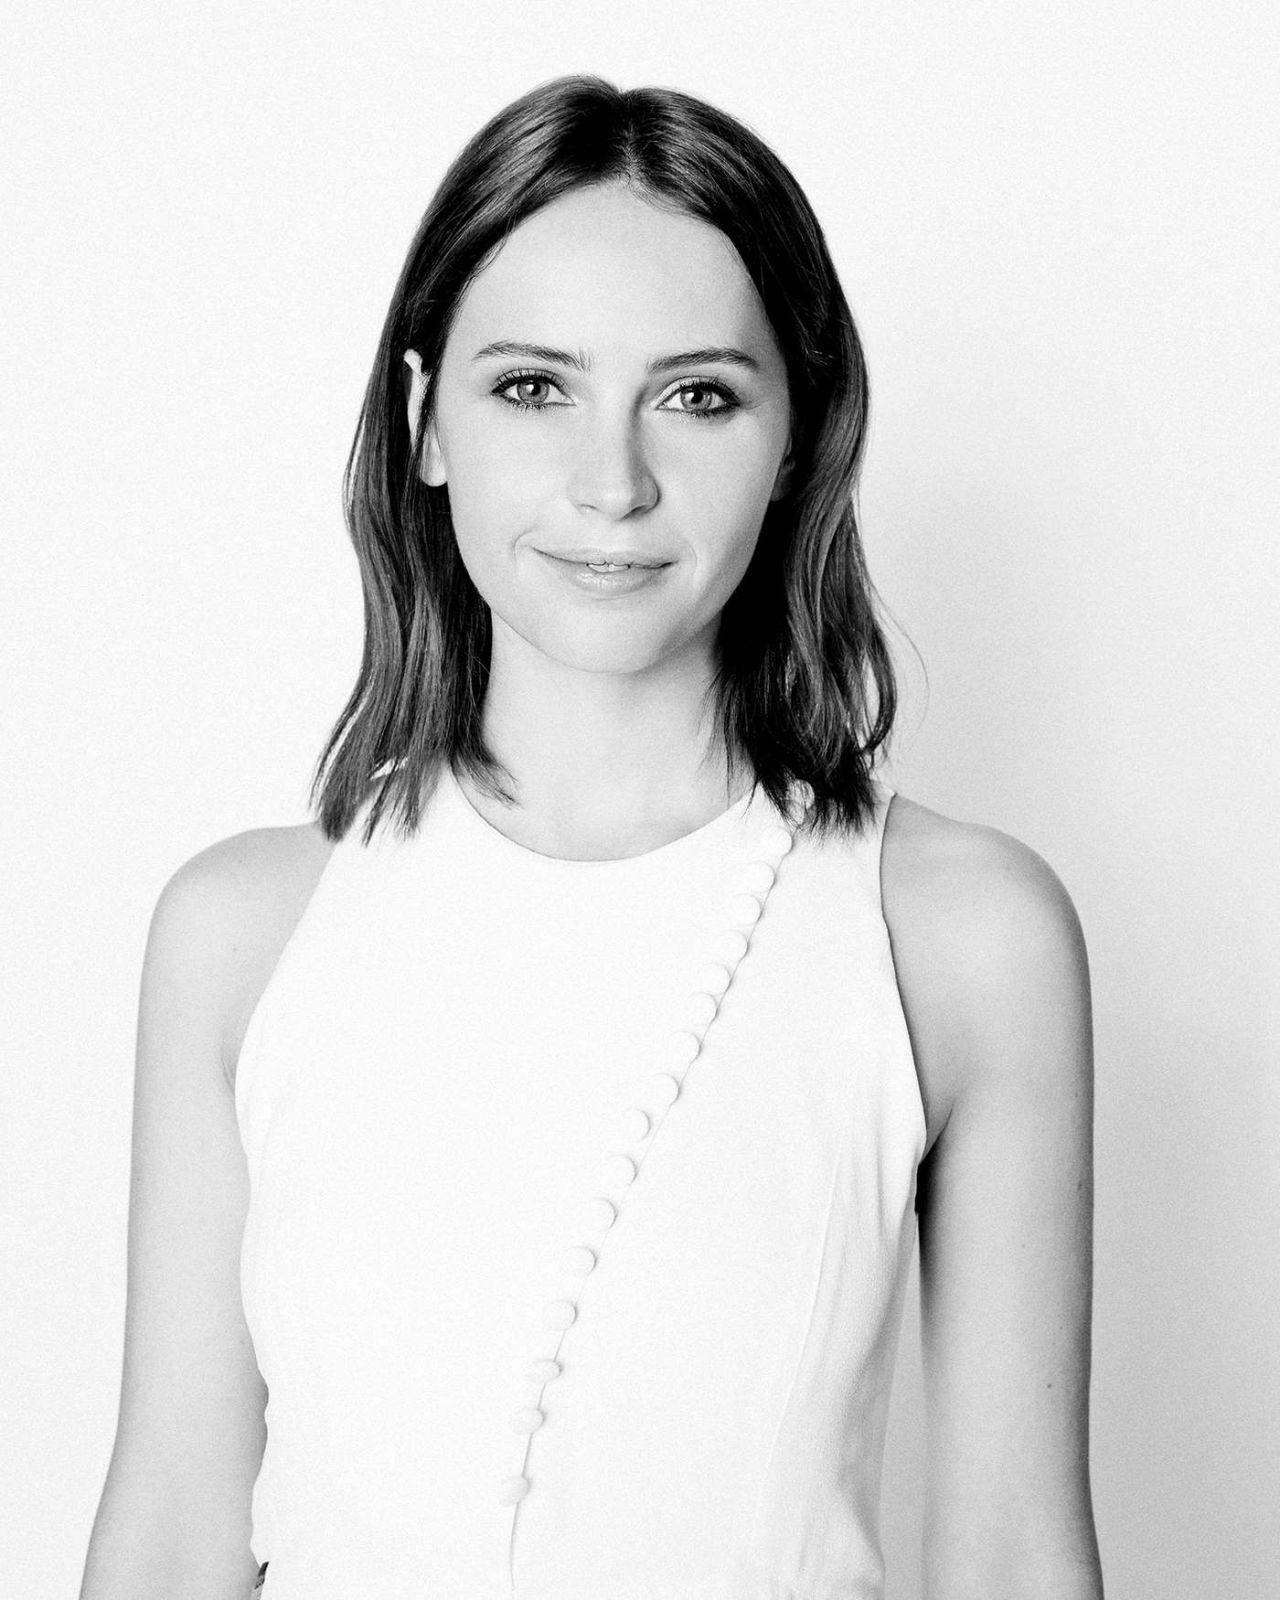 Felicity Jones – Yahoo! Style Photoshoot, January 2015